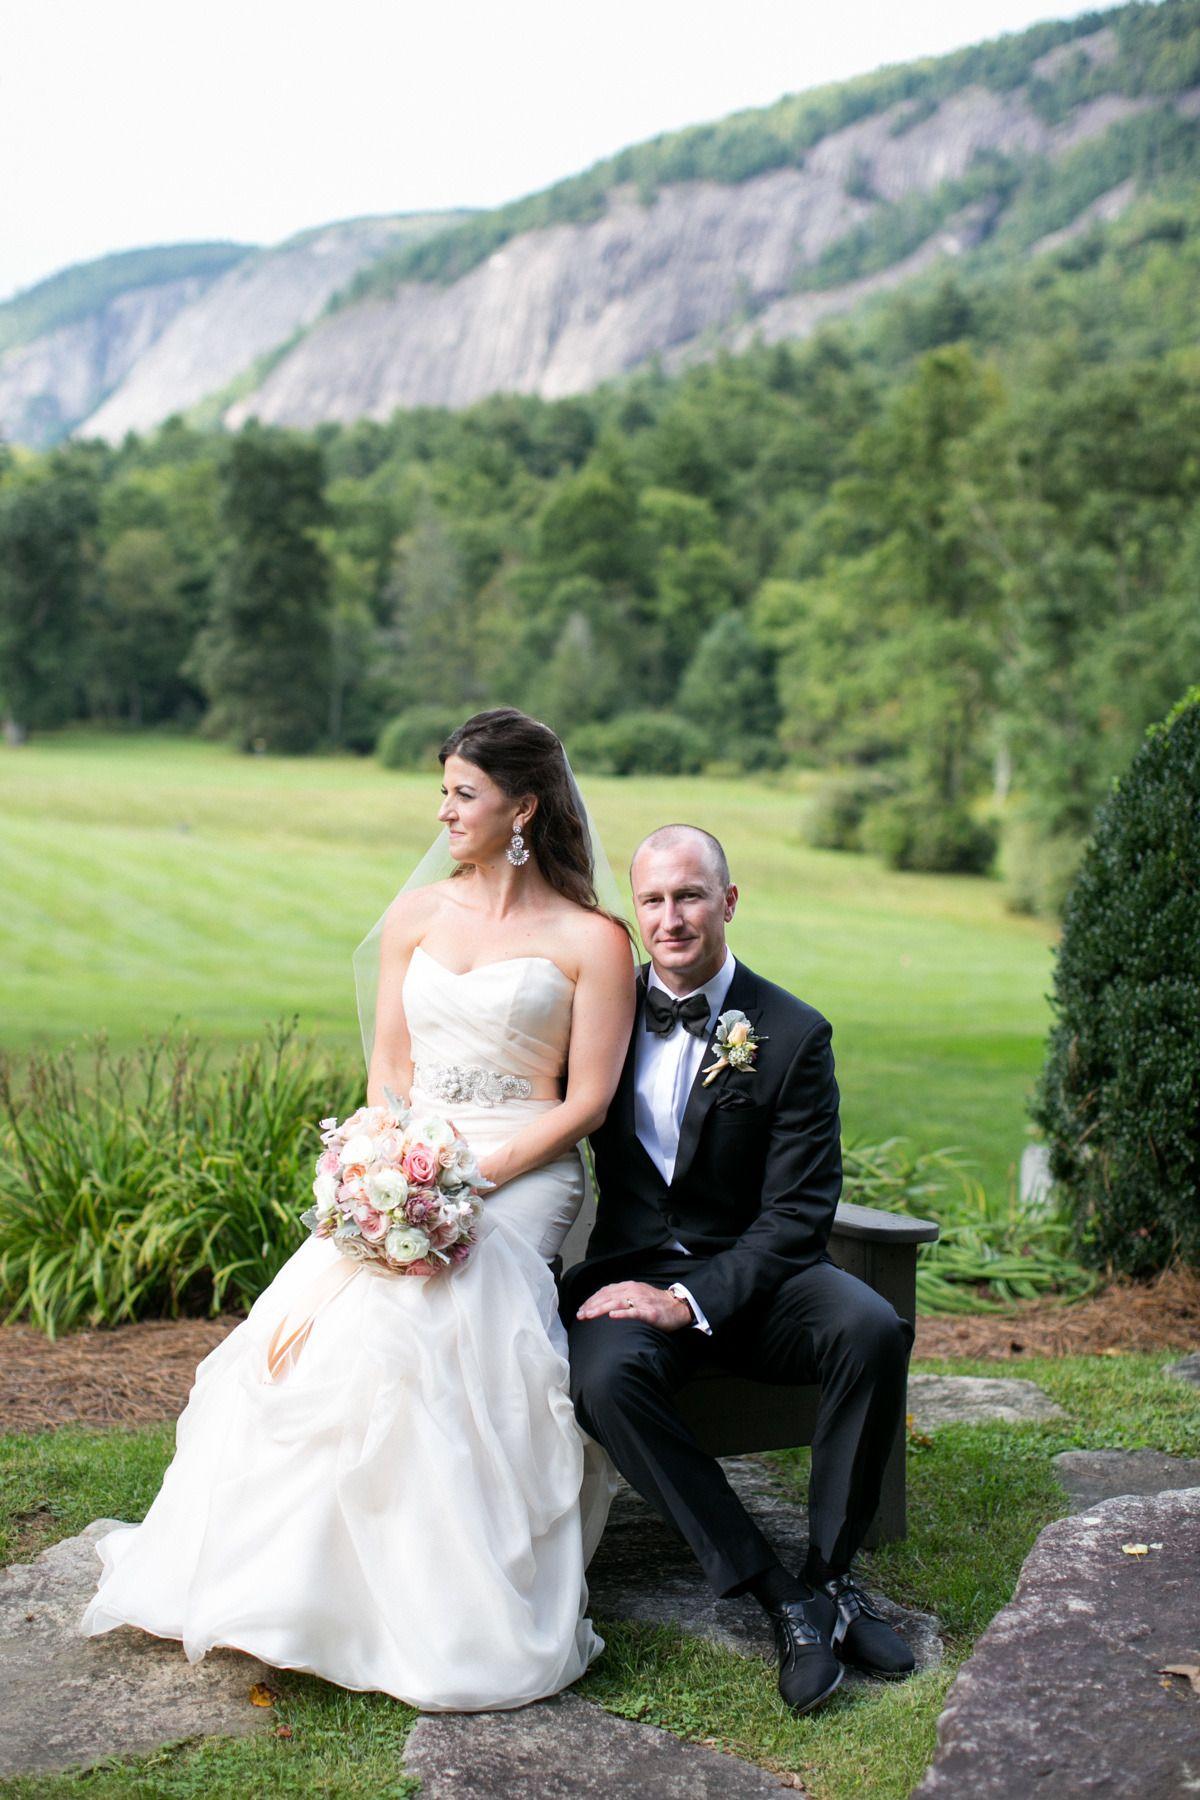 Photography: Sunday Grant Photography - sundaygrant.com  Read More: http://www.stylemepretty.com/2015/04/30/romantic-north-carolina-mountain-wedding/